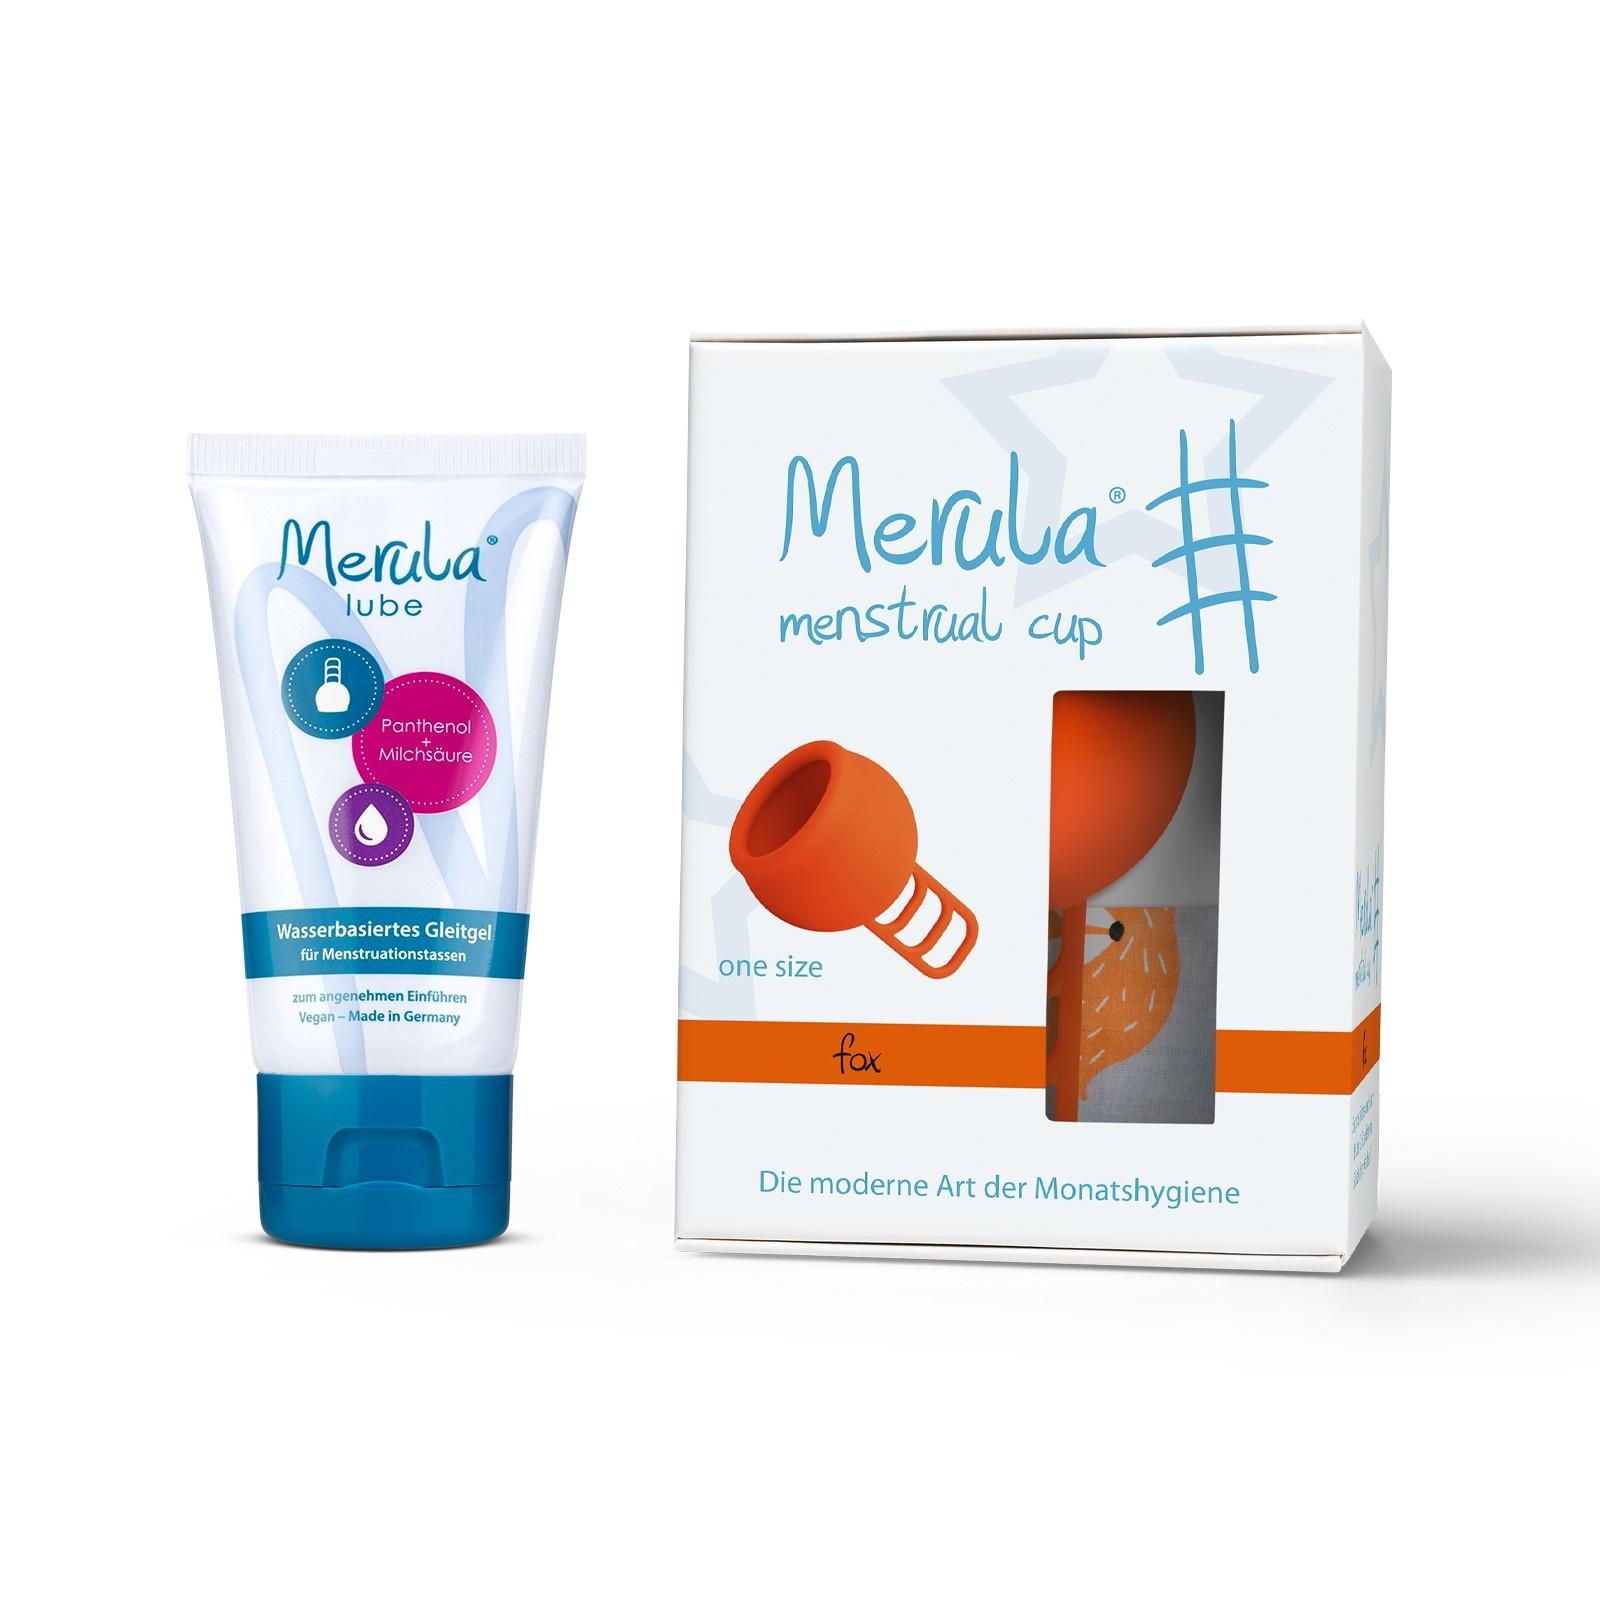 Merula Merula cup met Merula lube - fox oranje